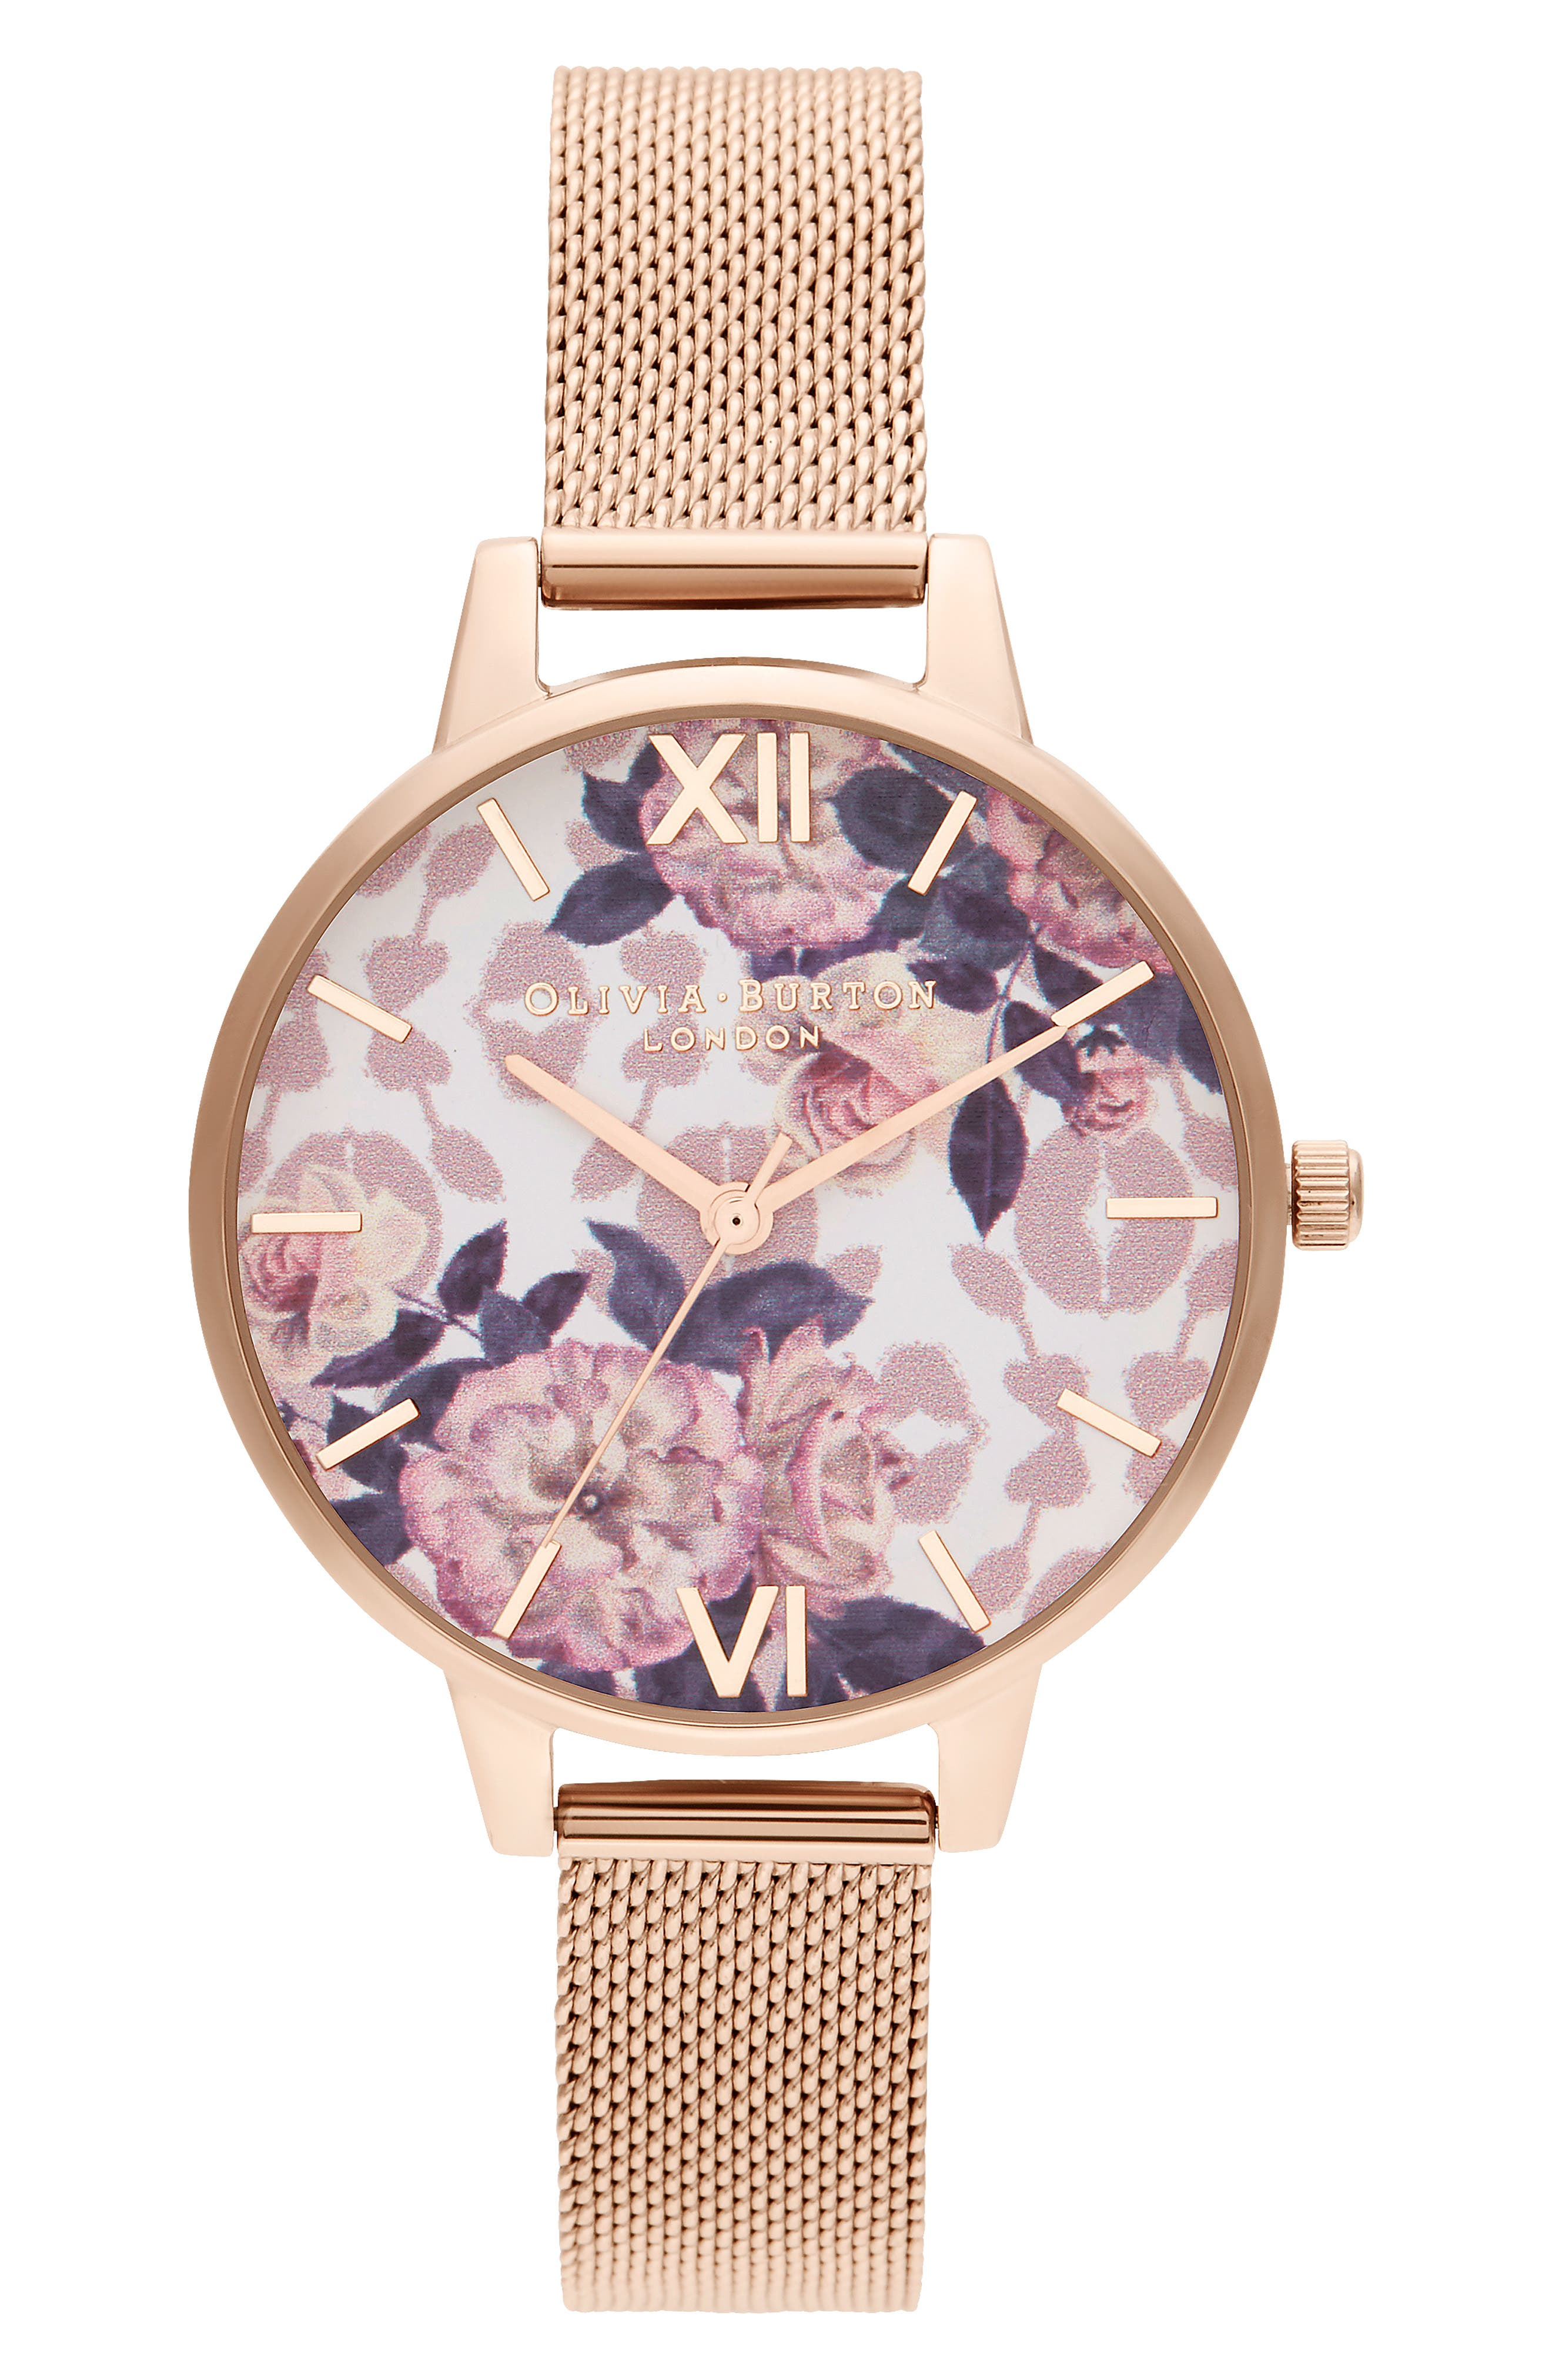 Image of OLIVIA BURTON Women's Wildflower Mesh Strap Watch, 34mm